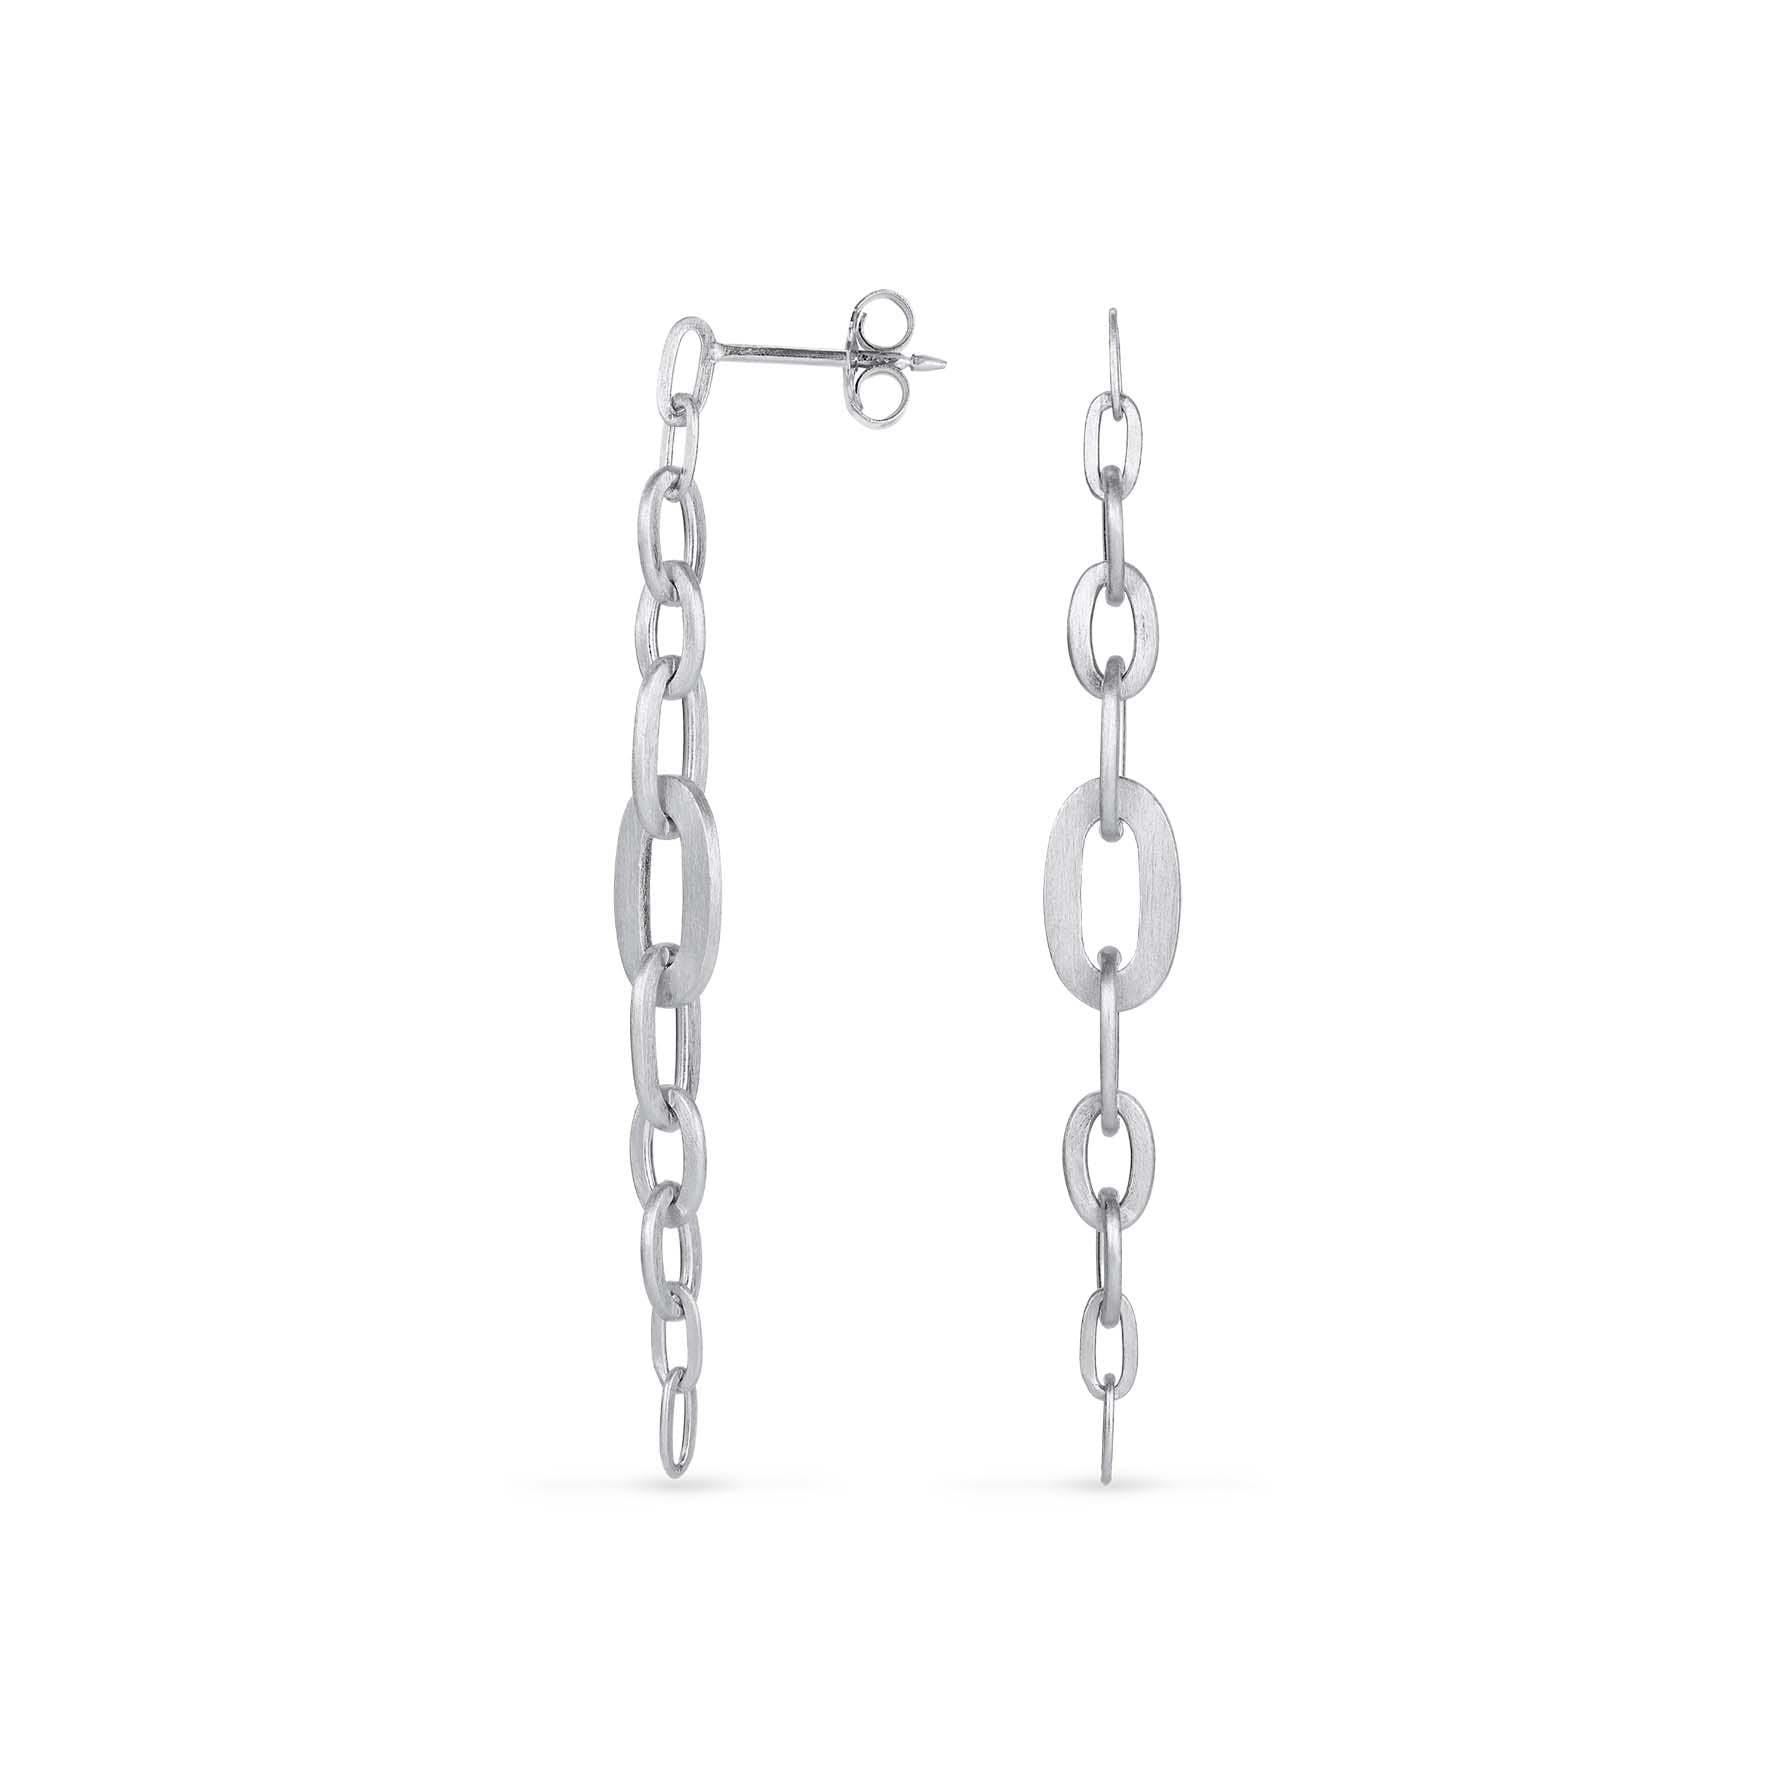 Row Chain Earring von Jane Kønig in Silber Sterling 925